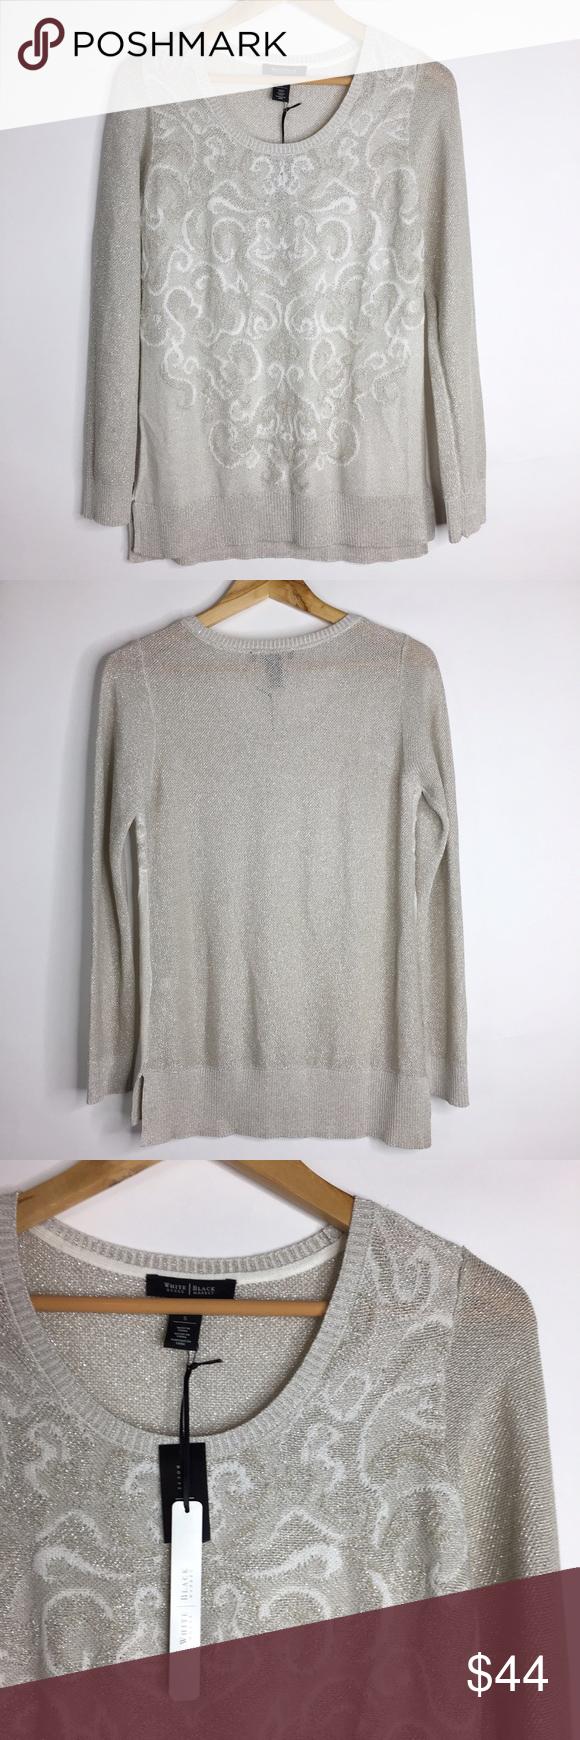 WHBM Sweater Light Tan/gray Size Small NWT